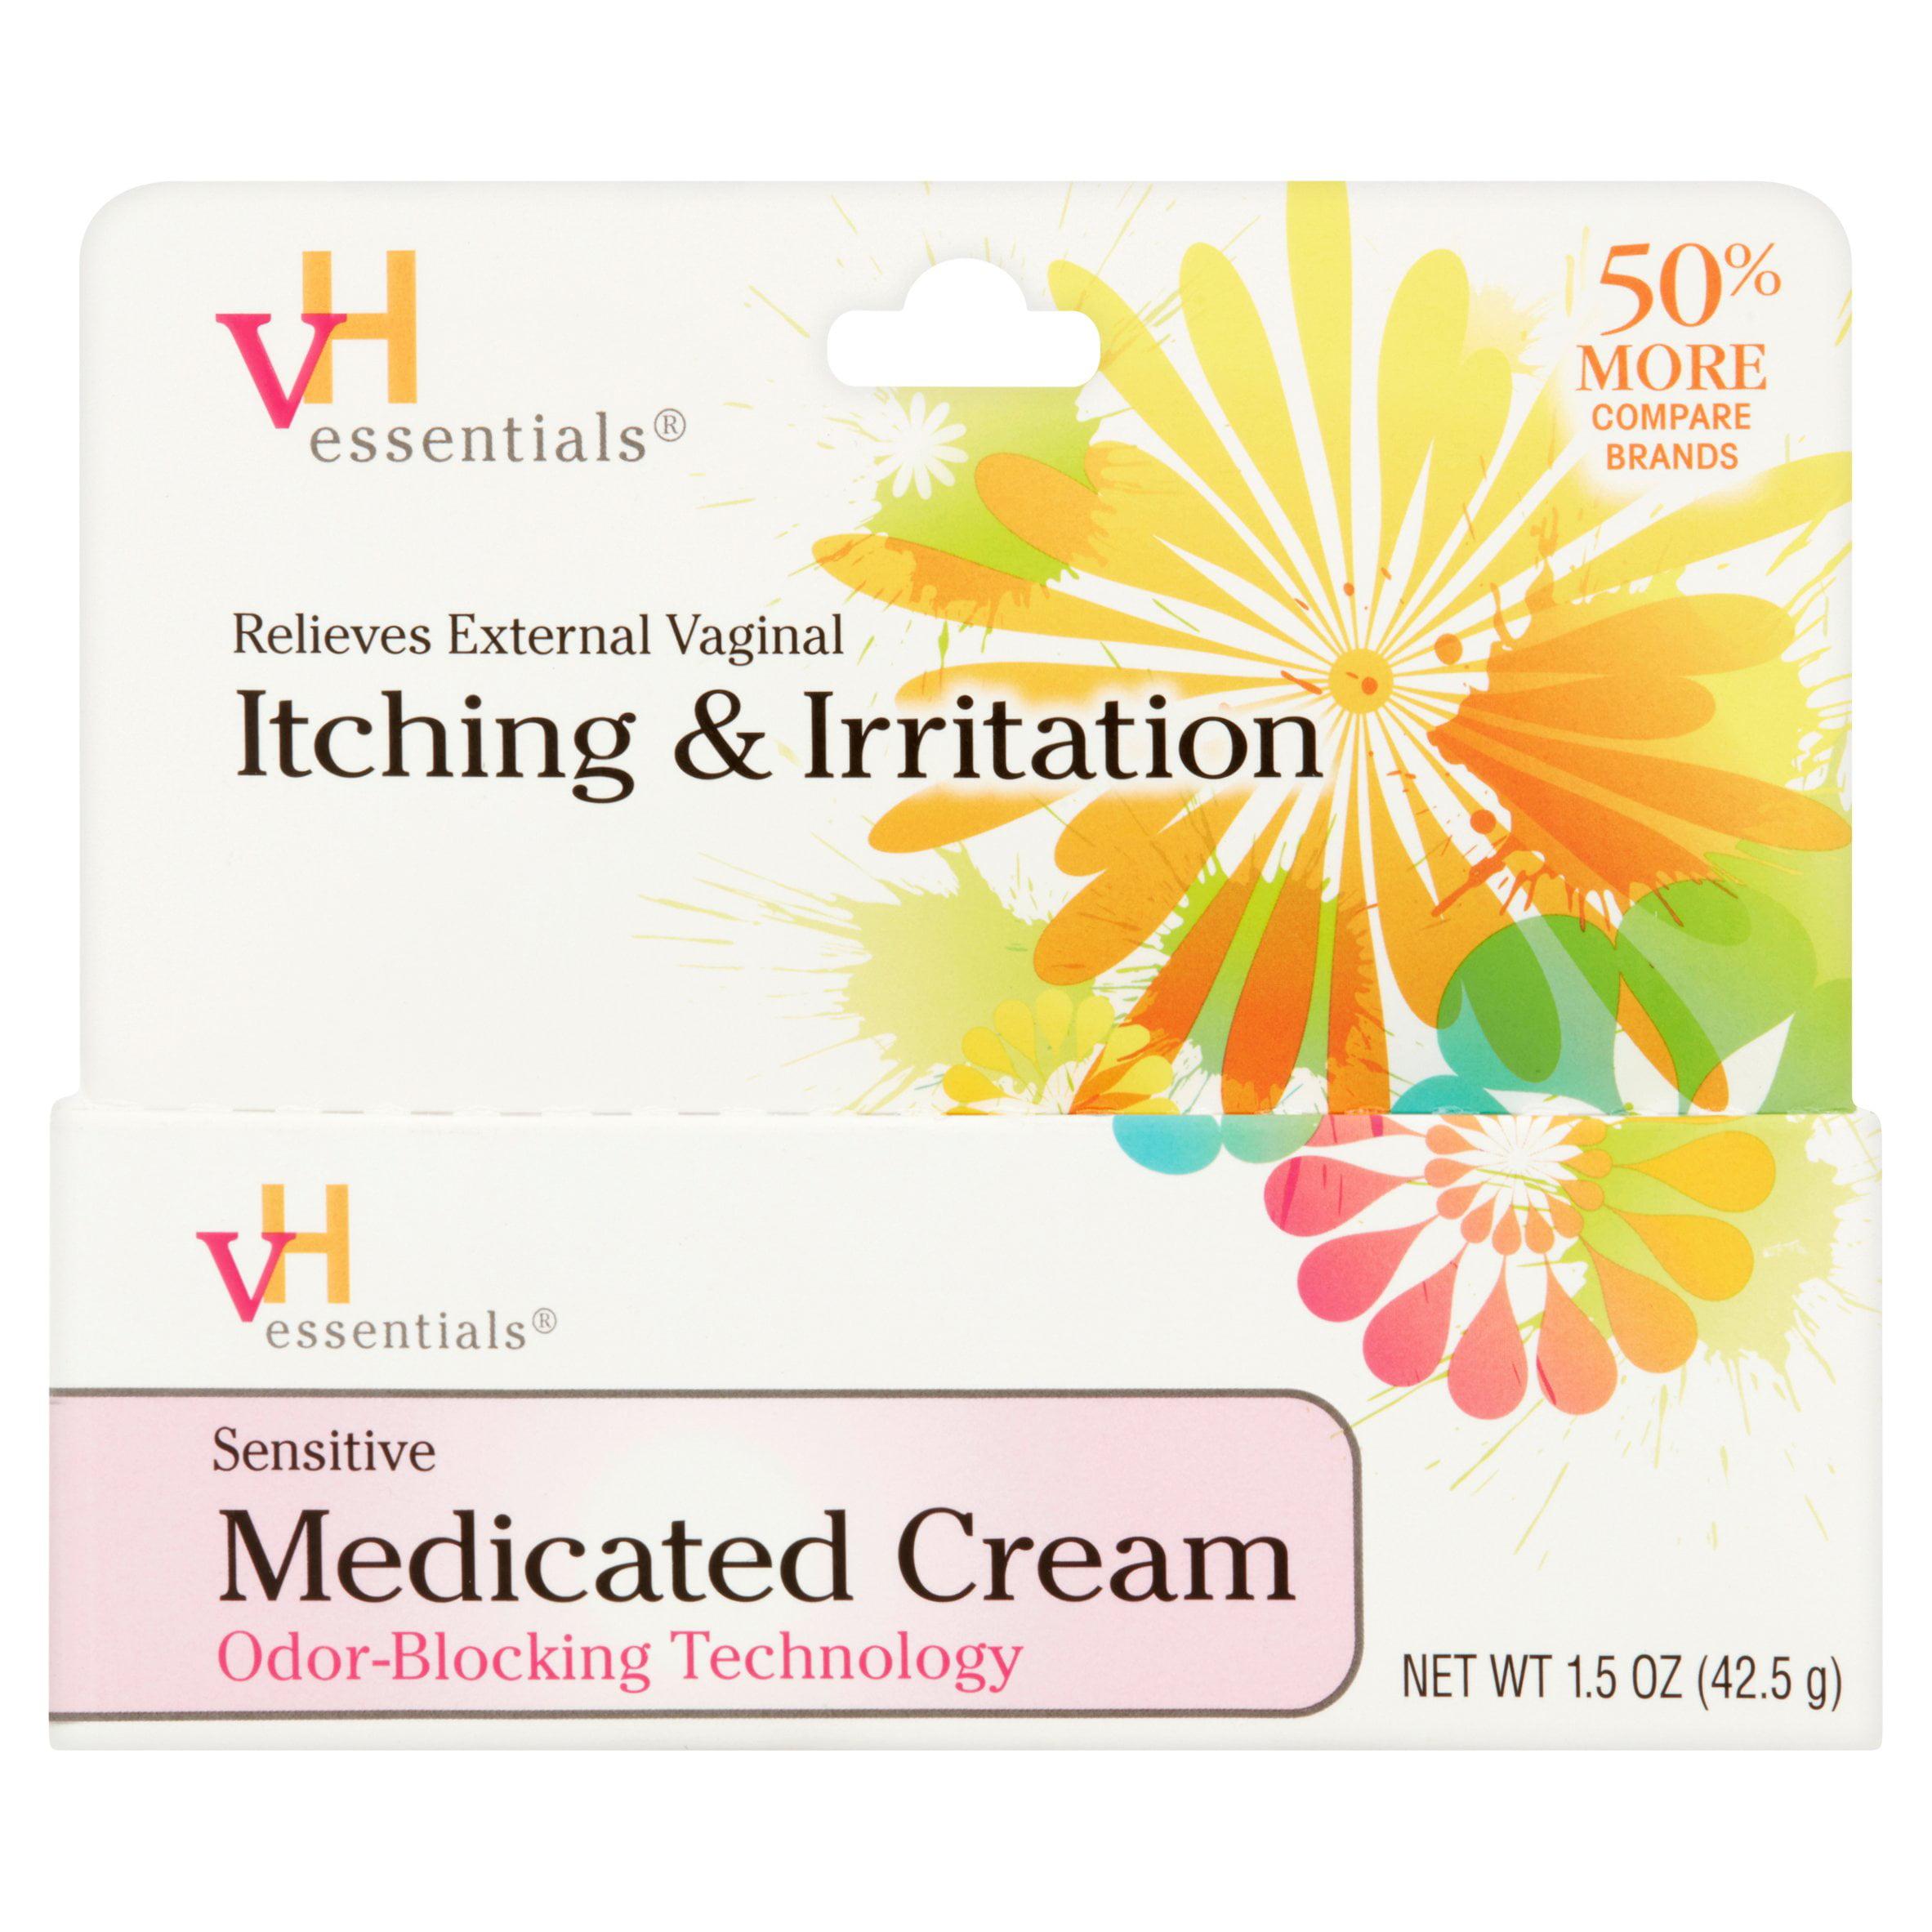 Vh essentials bv treatment coupons 2018